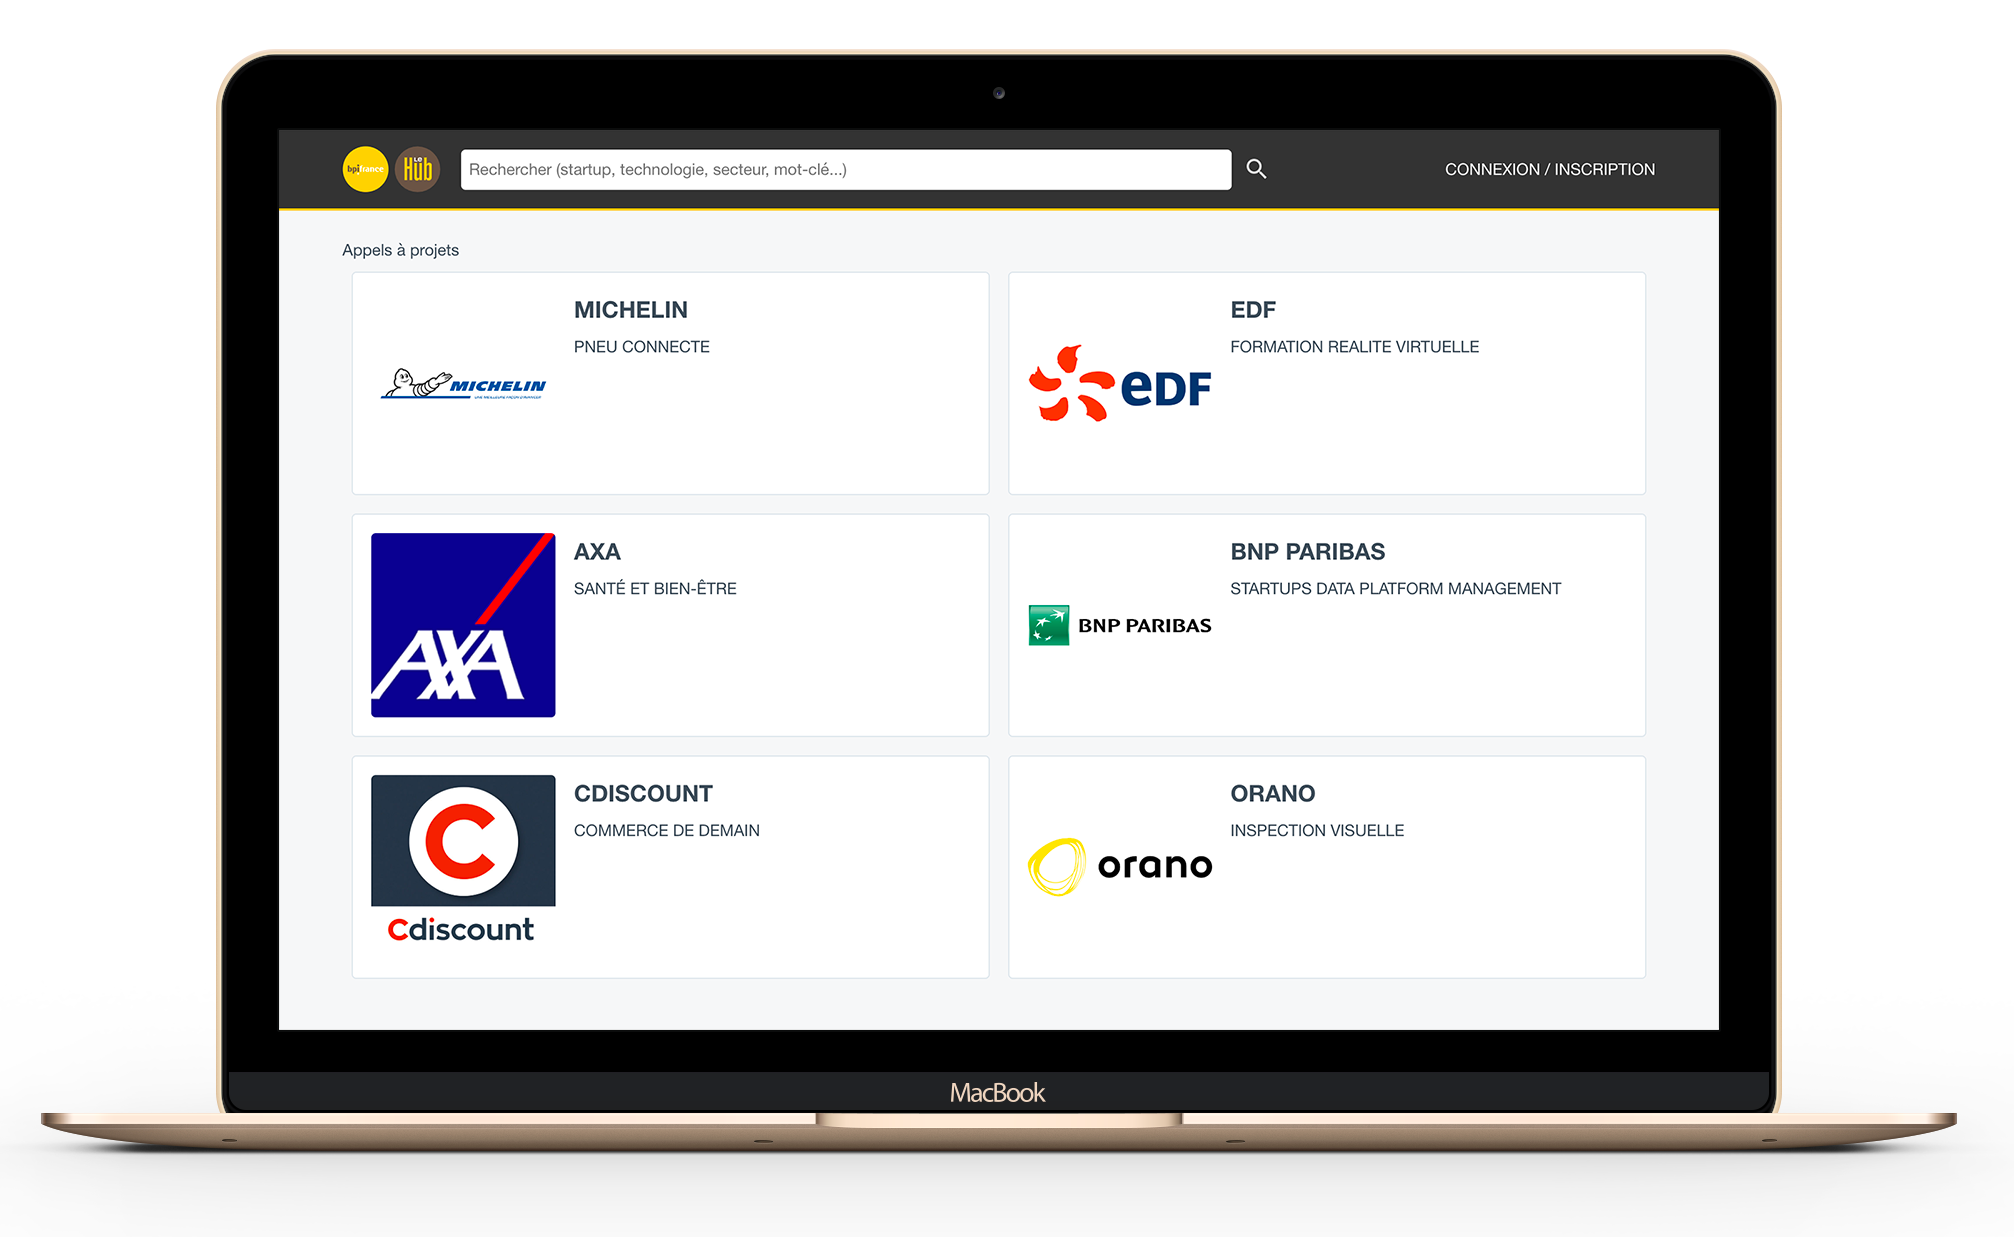 Aperçu du Hub Digital - Appel à projets page